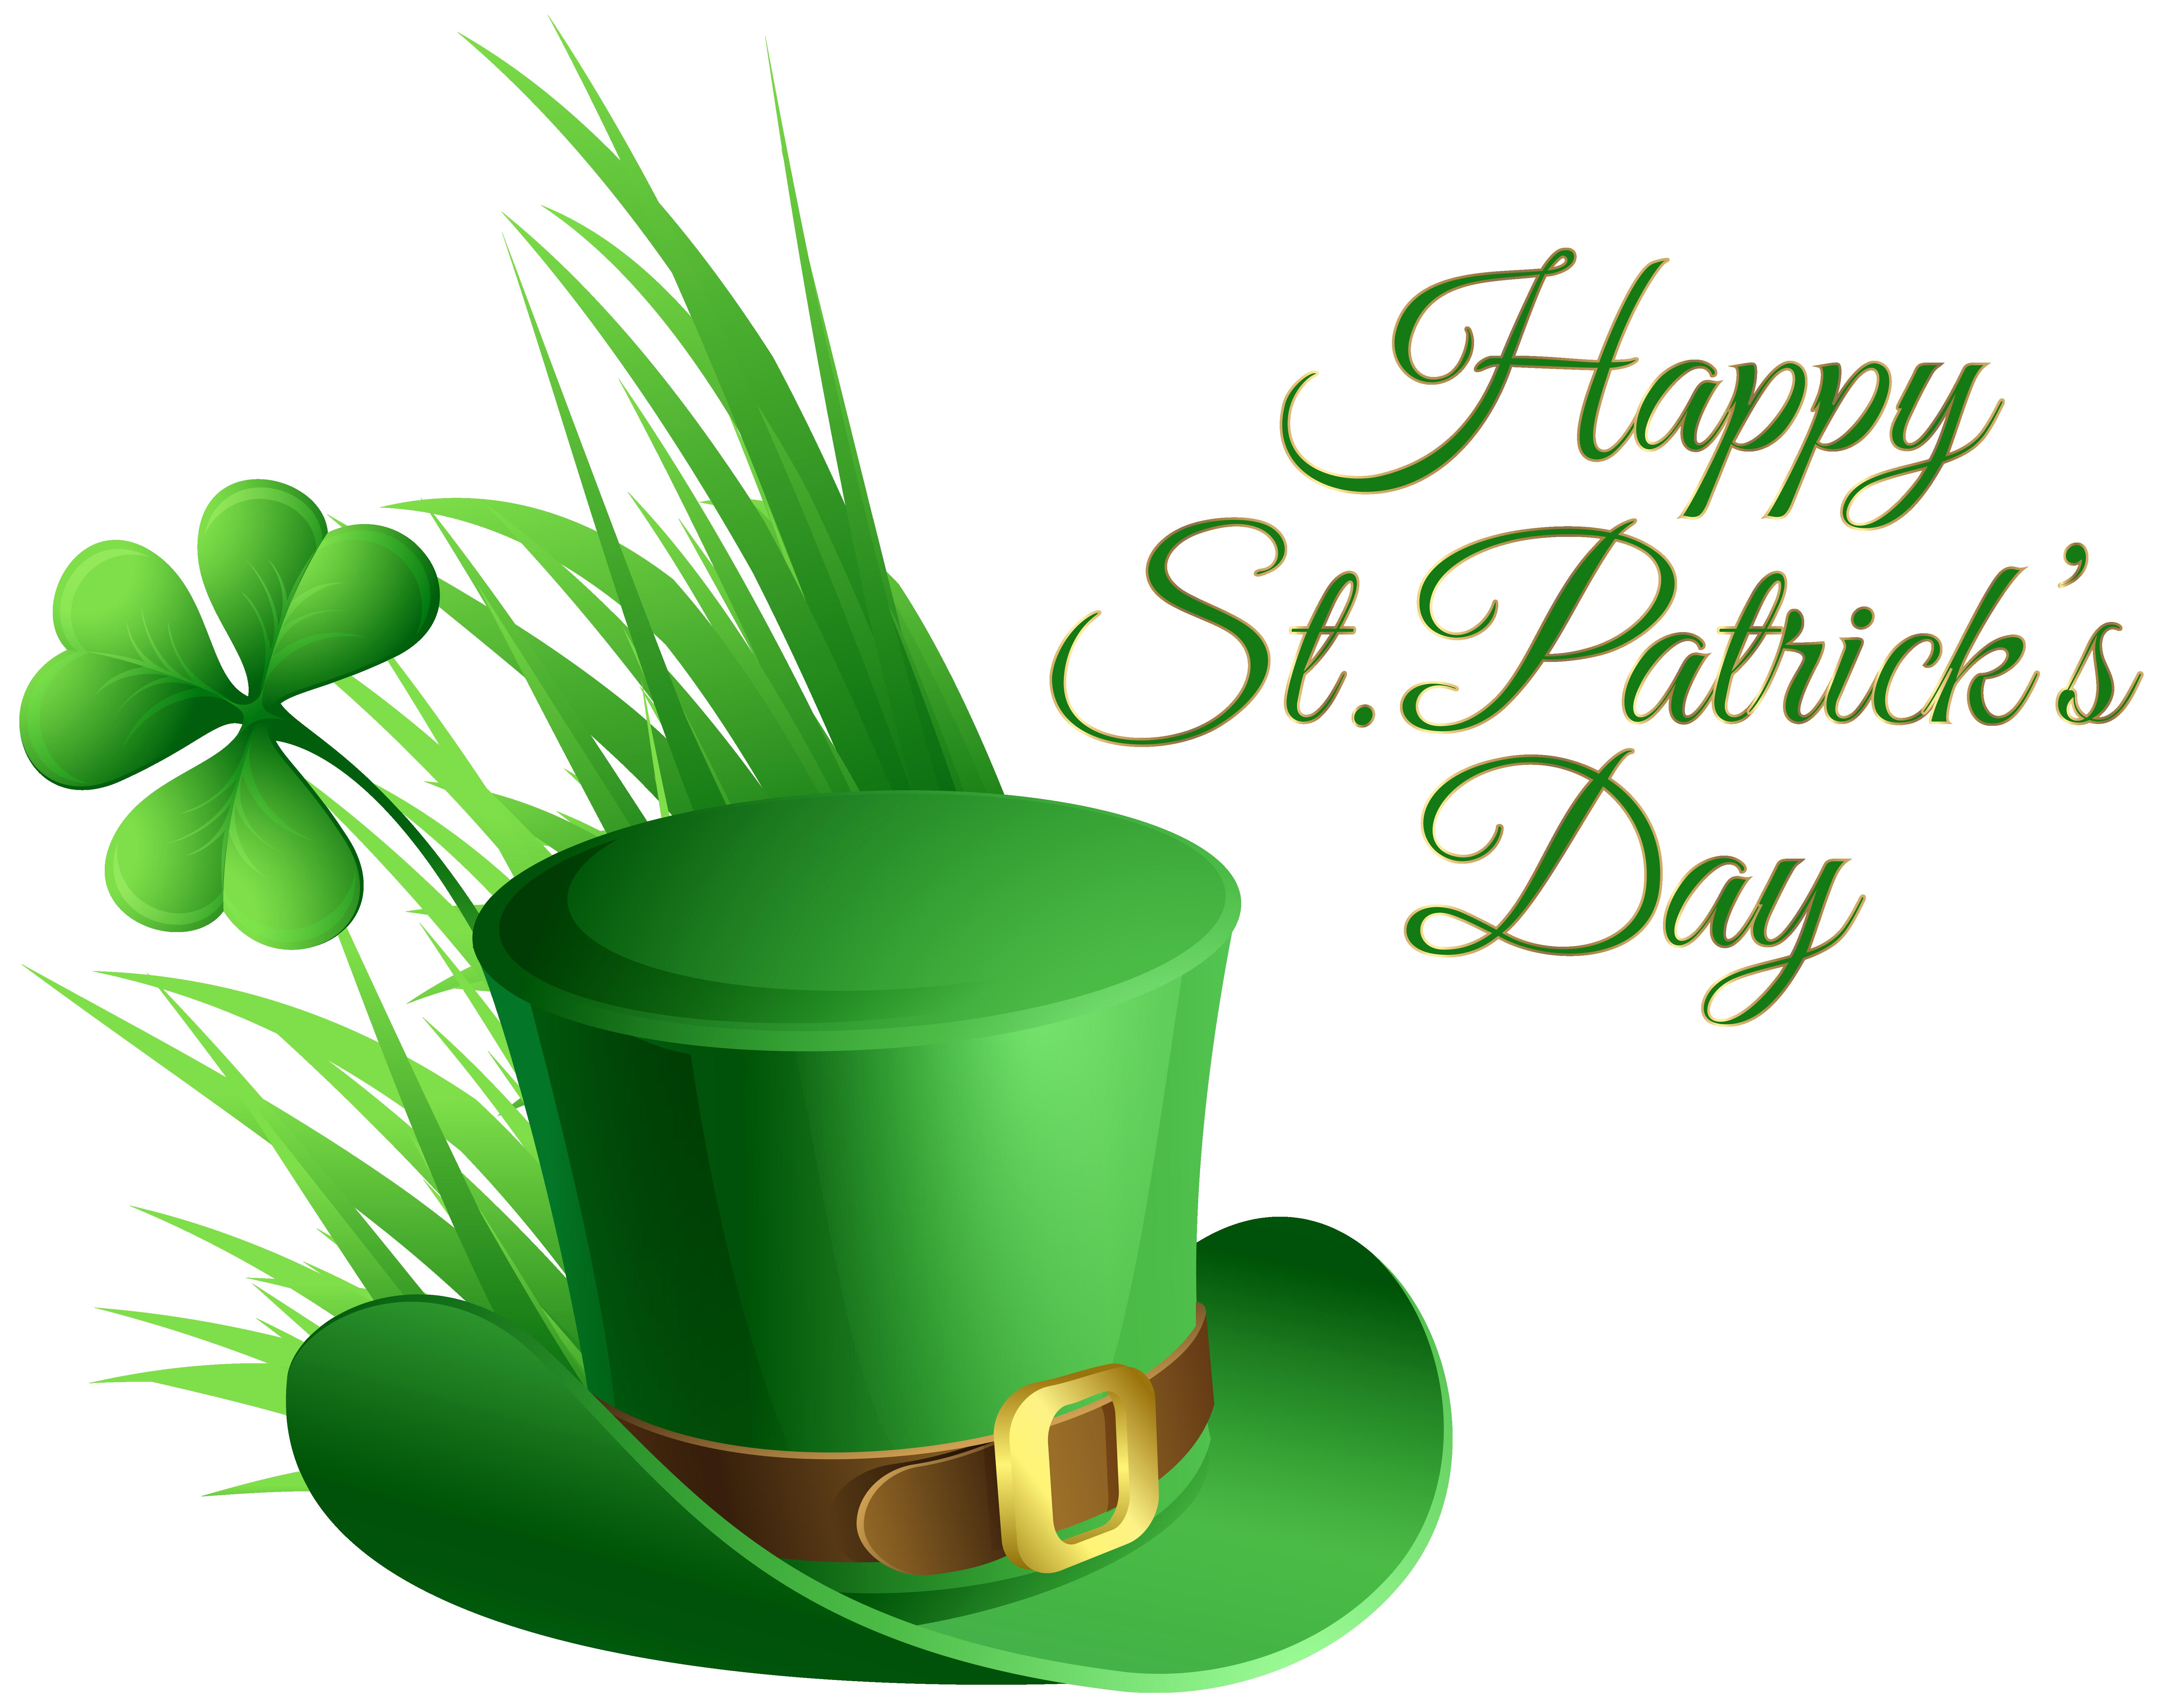 7246x5723 Rosa, Hat, Green St Patrick Day Clip Art